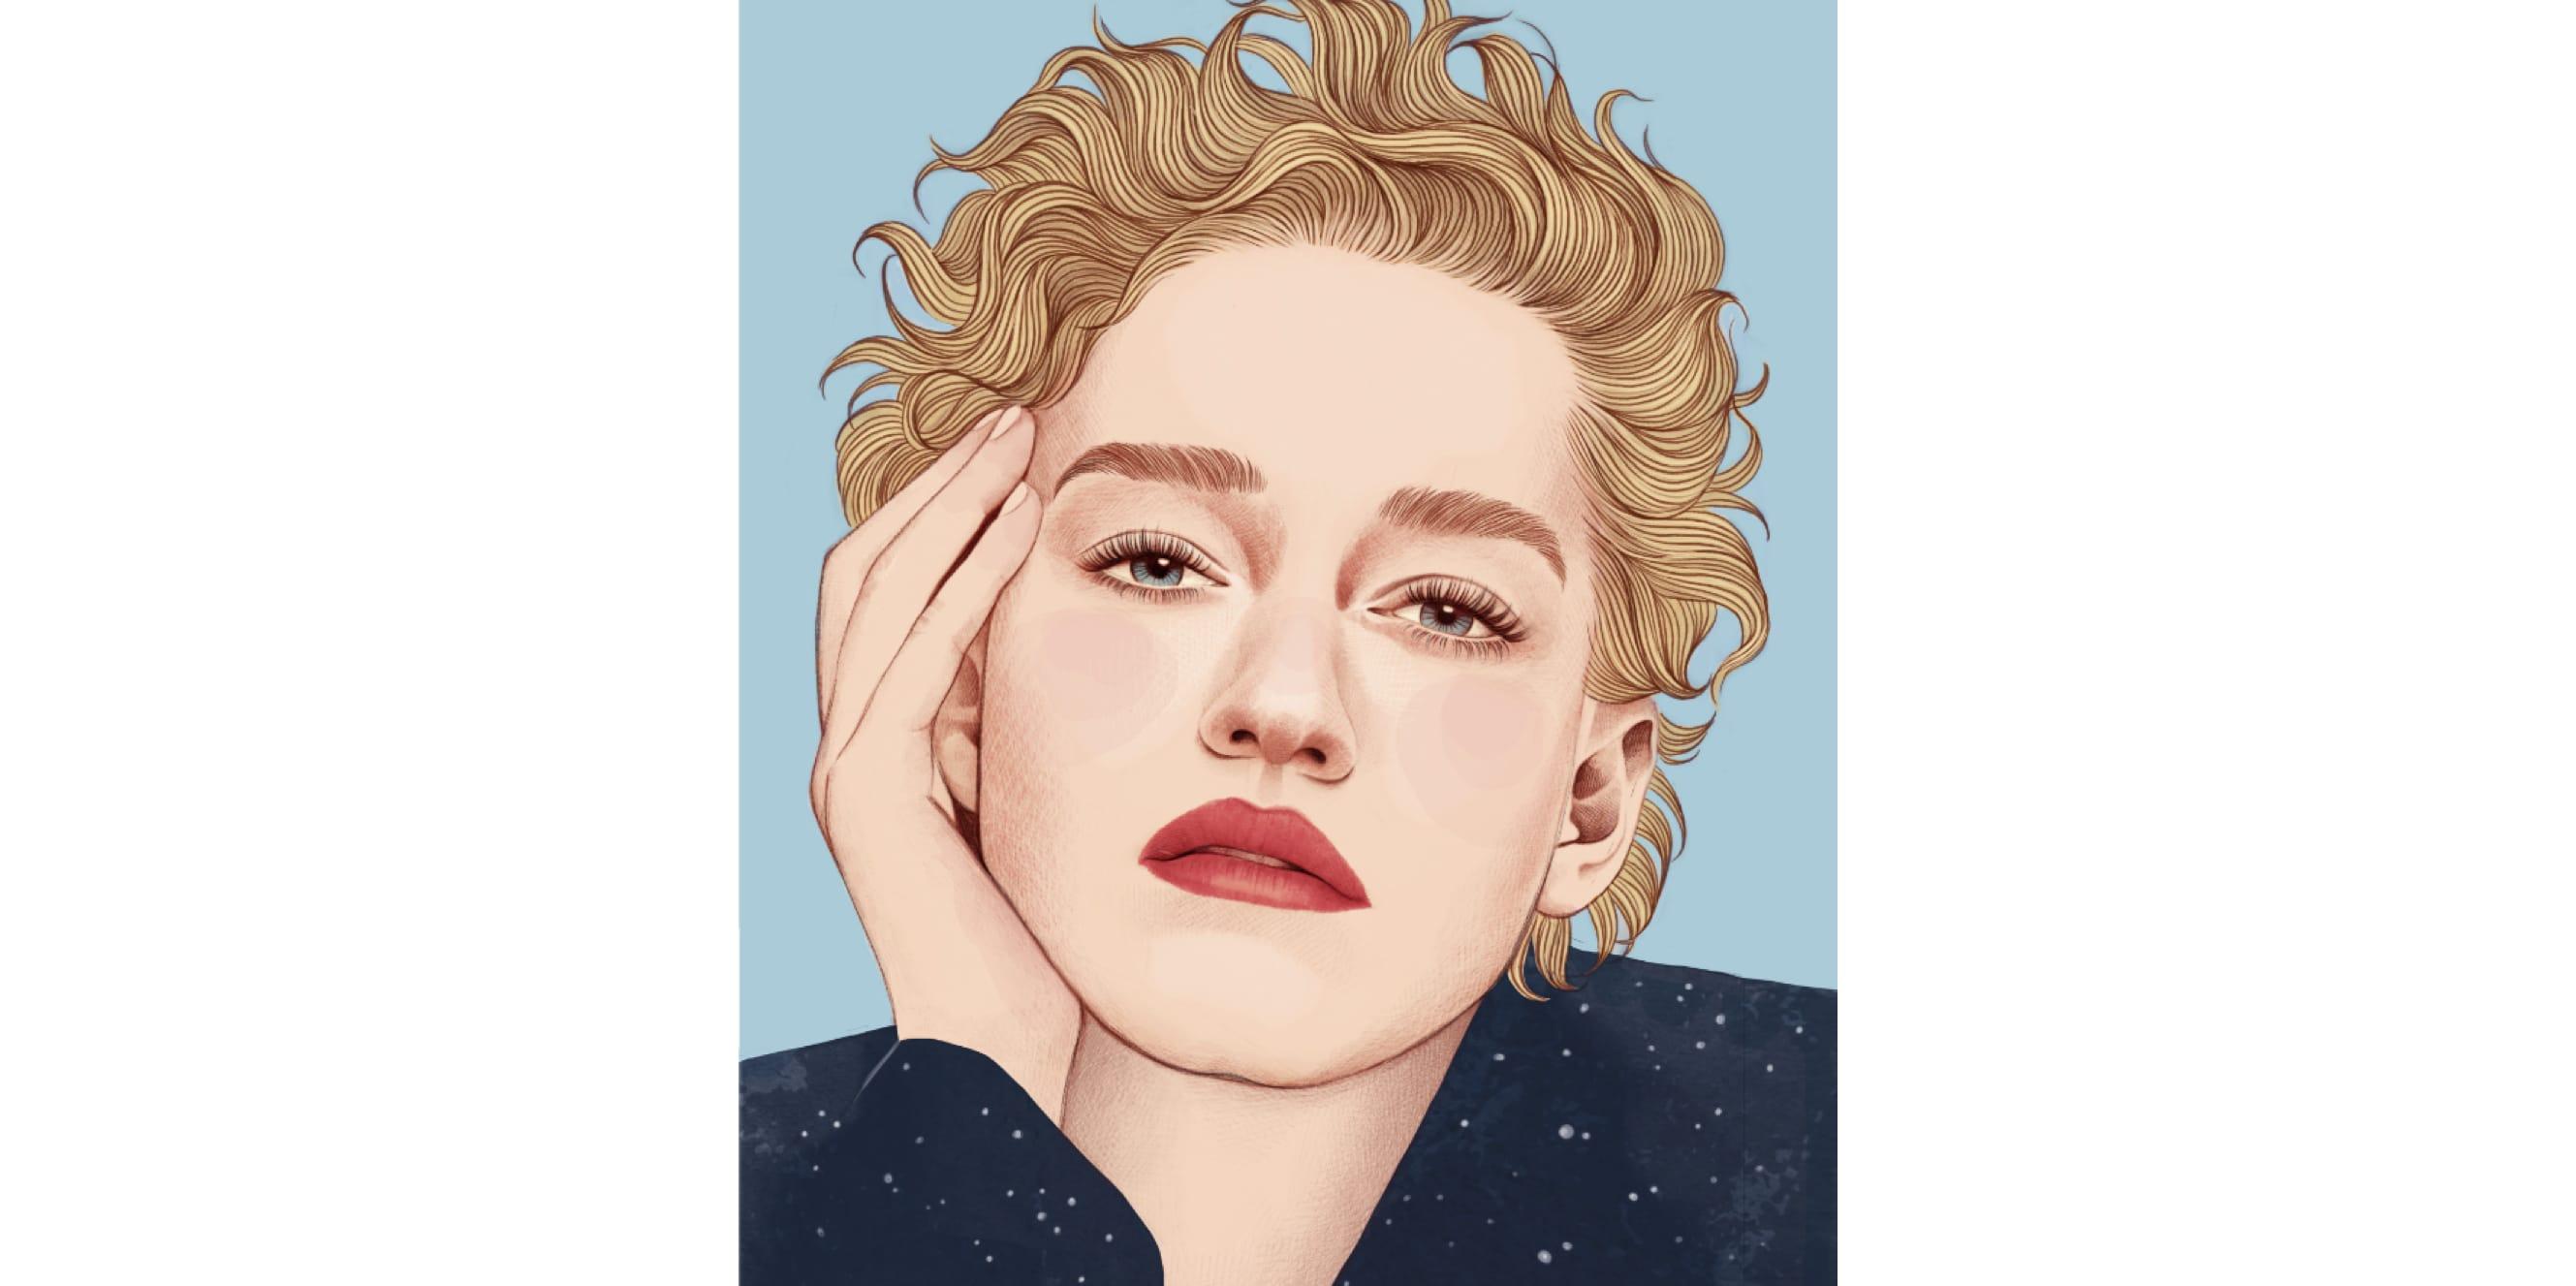 Art by Mercedes deBellard